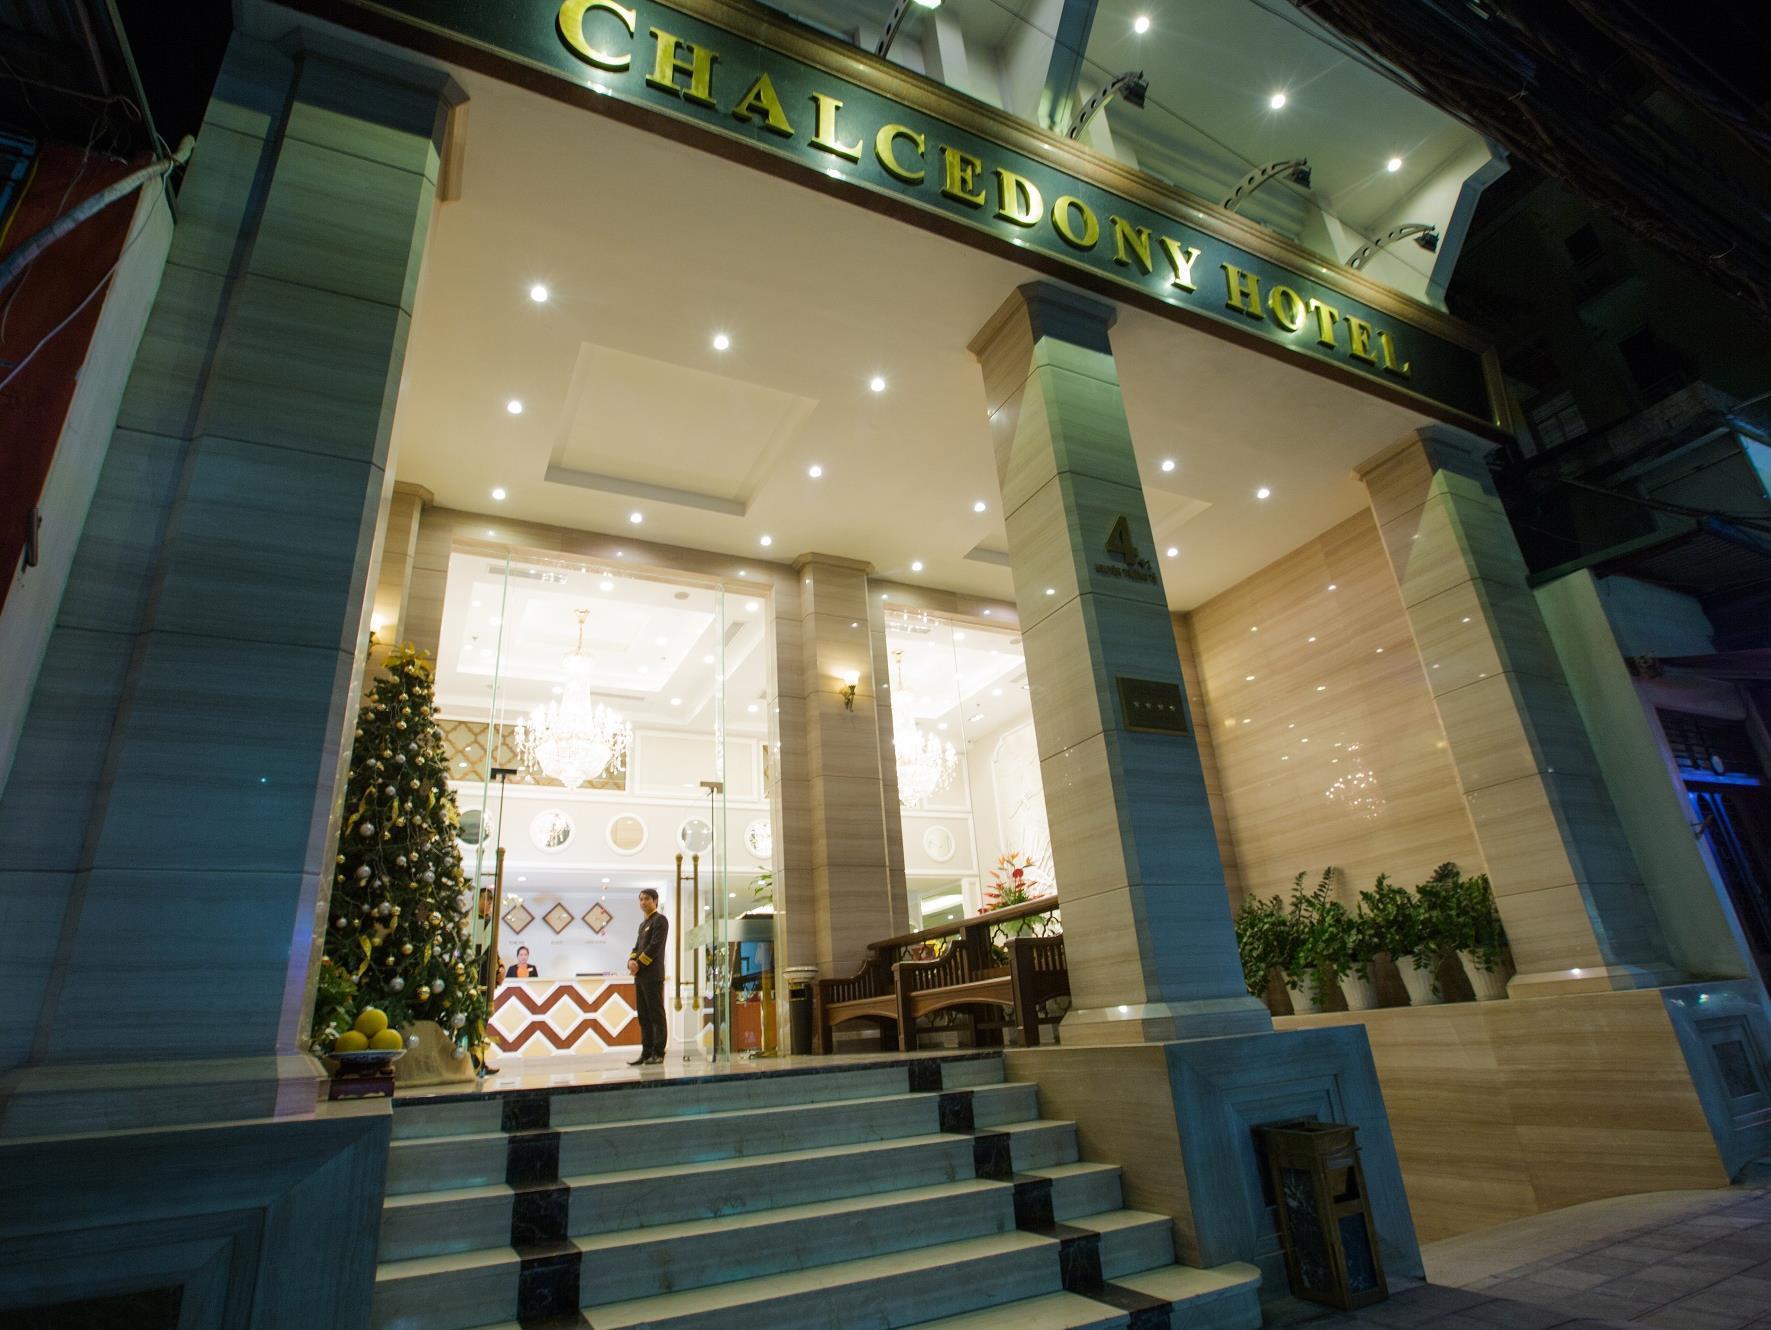 Chalcedony Hotel - Hotell och Boende i Vietnam , Hanoi